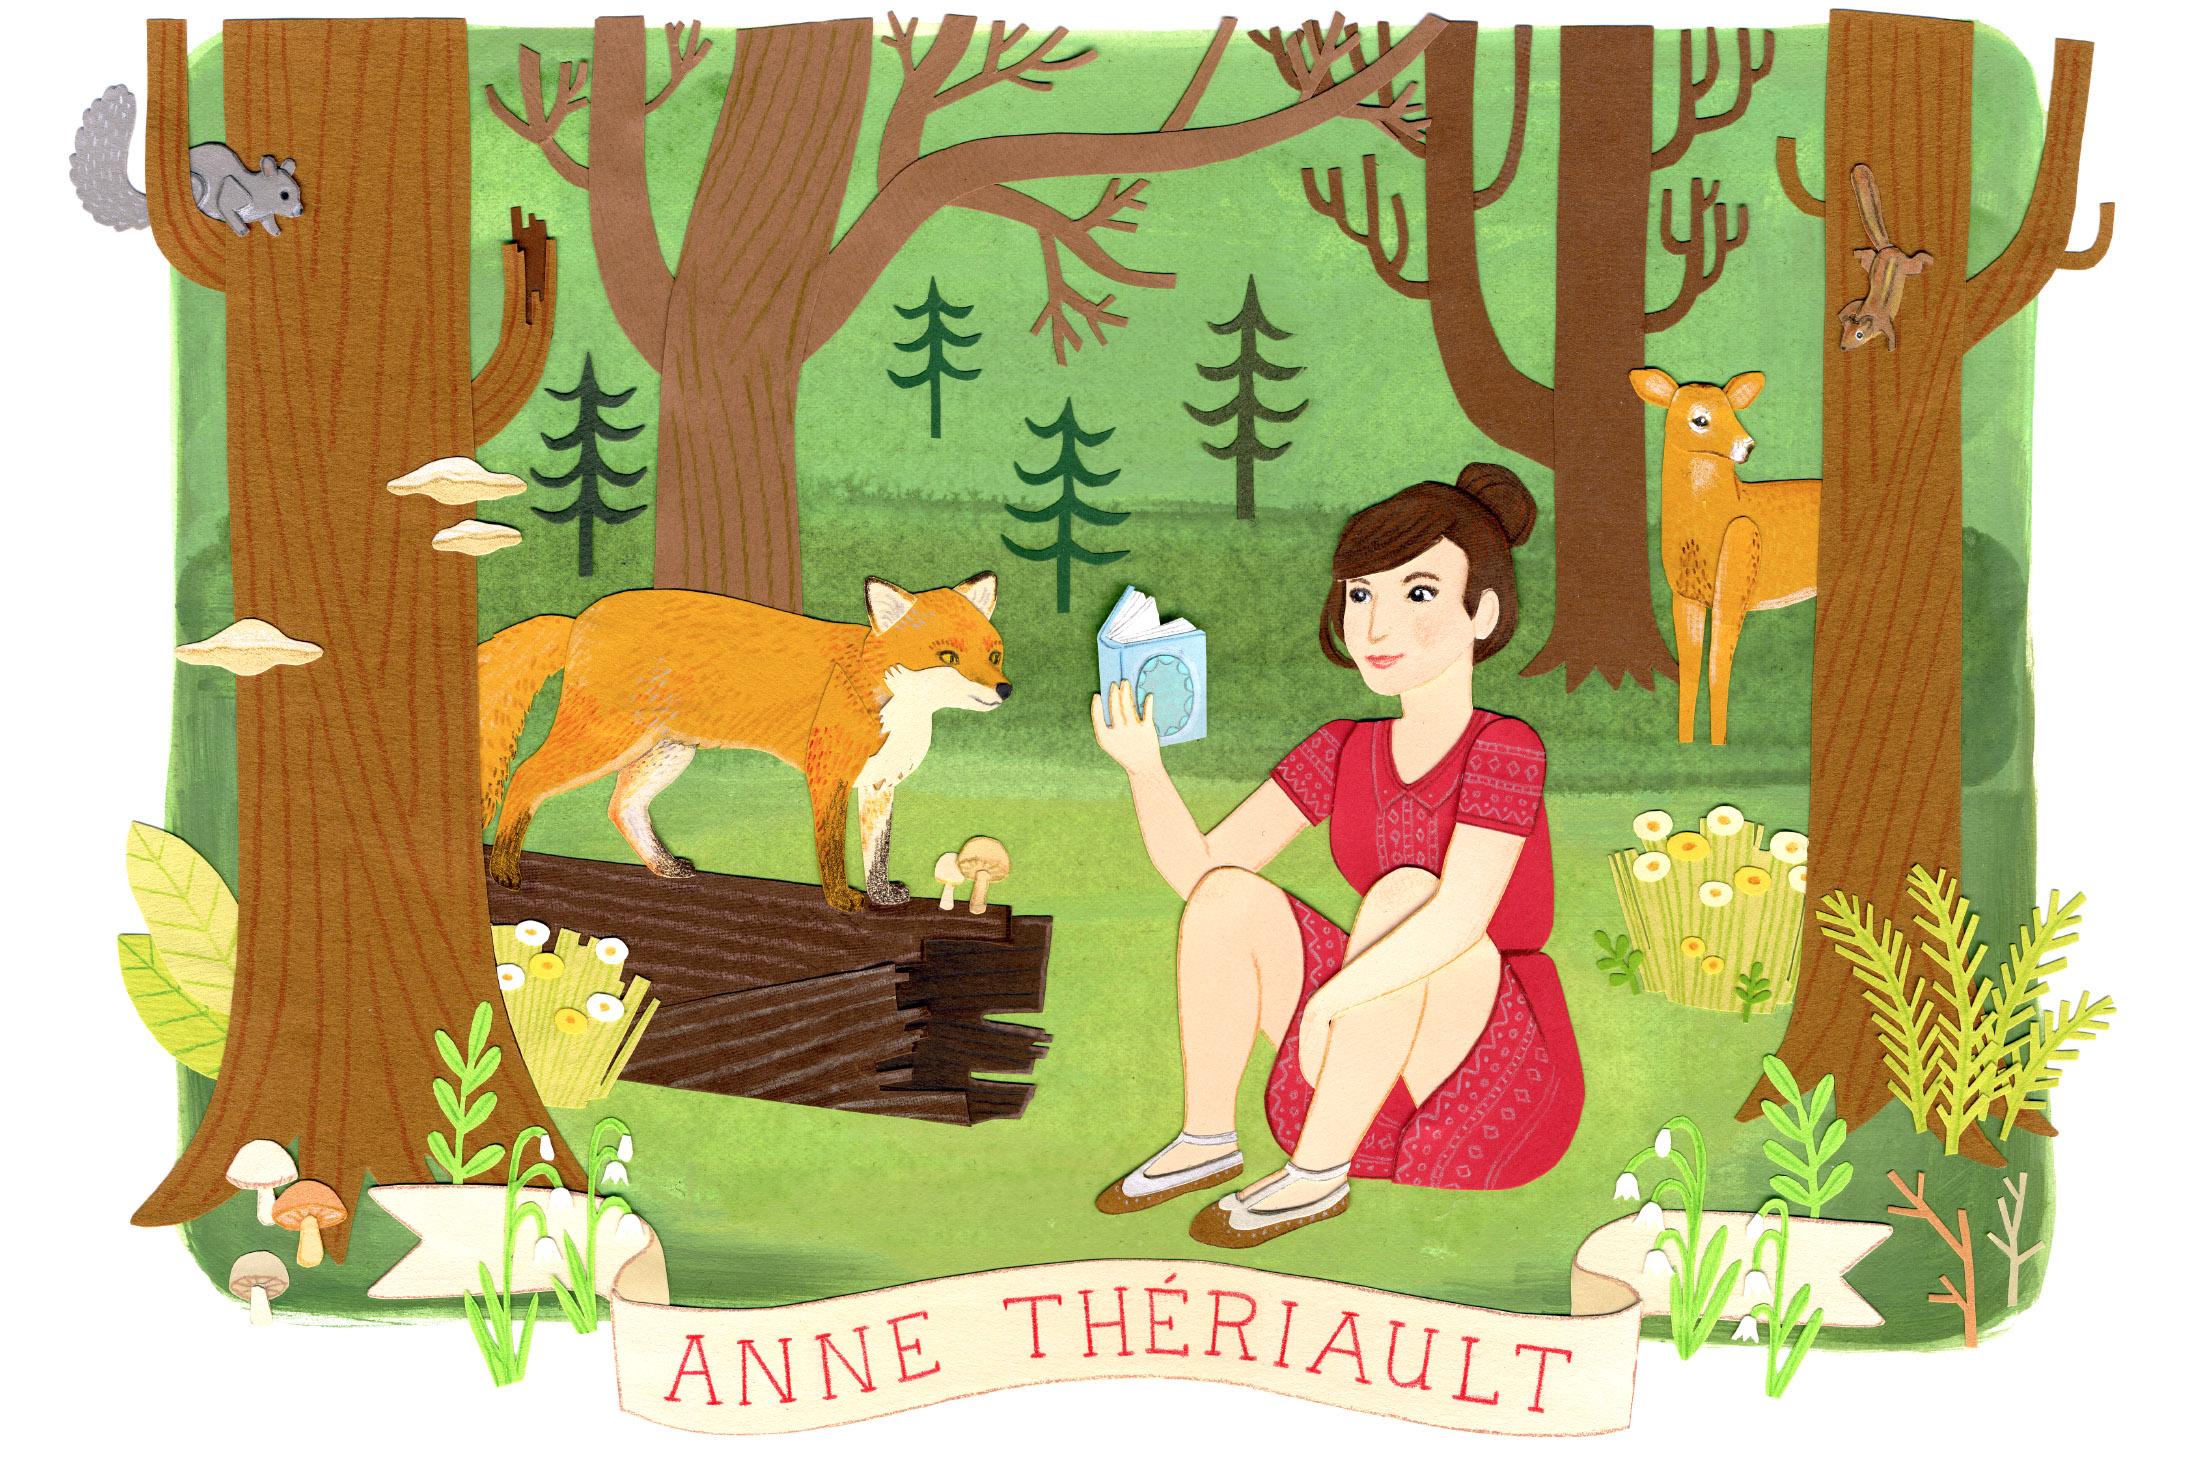 Anne_Thériault_forest_fox_woman_paper_cut_illustration.jpg